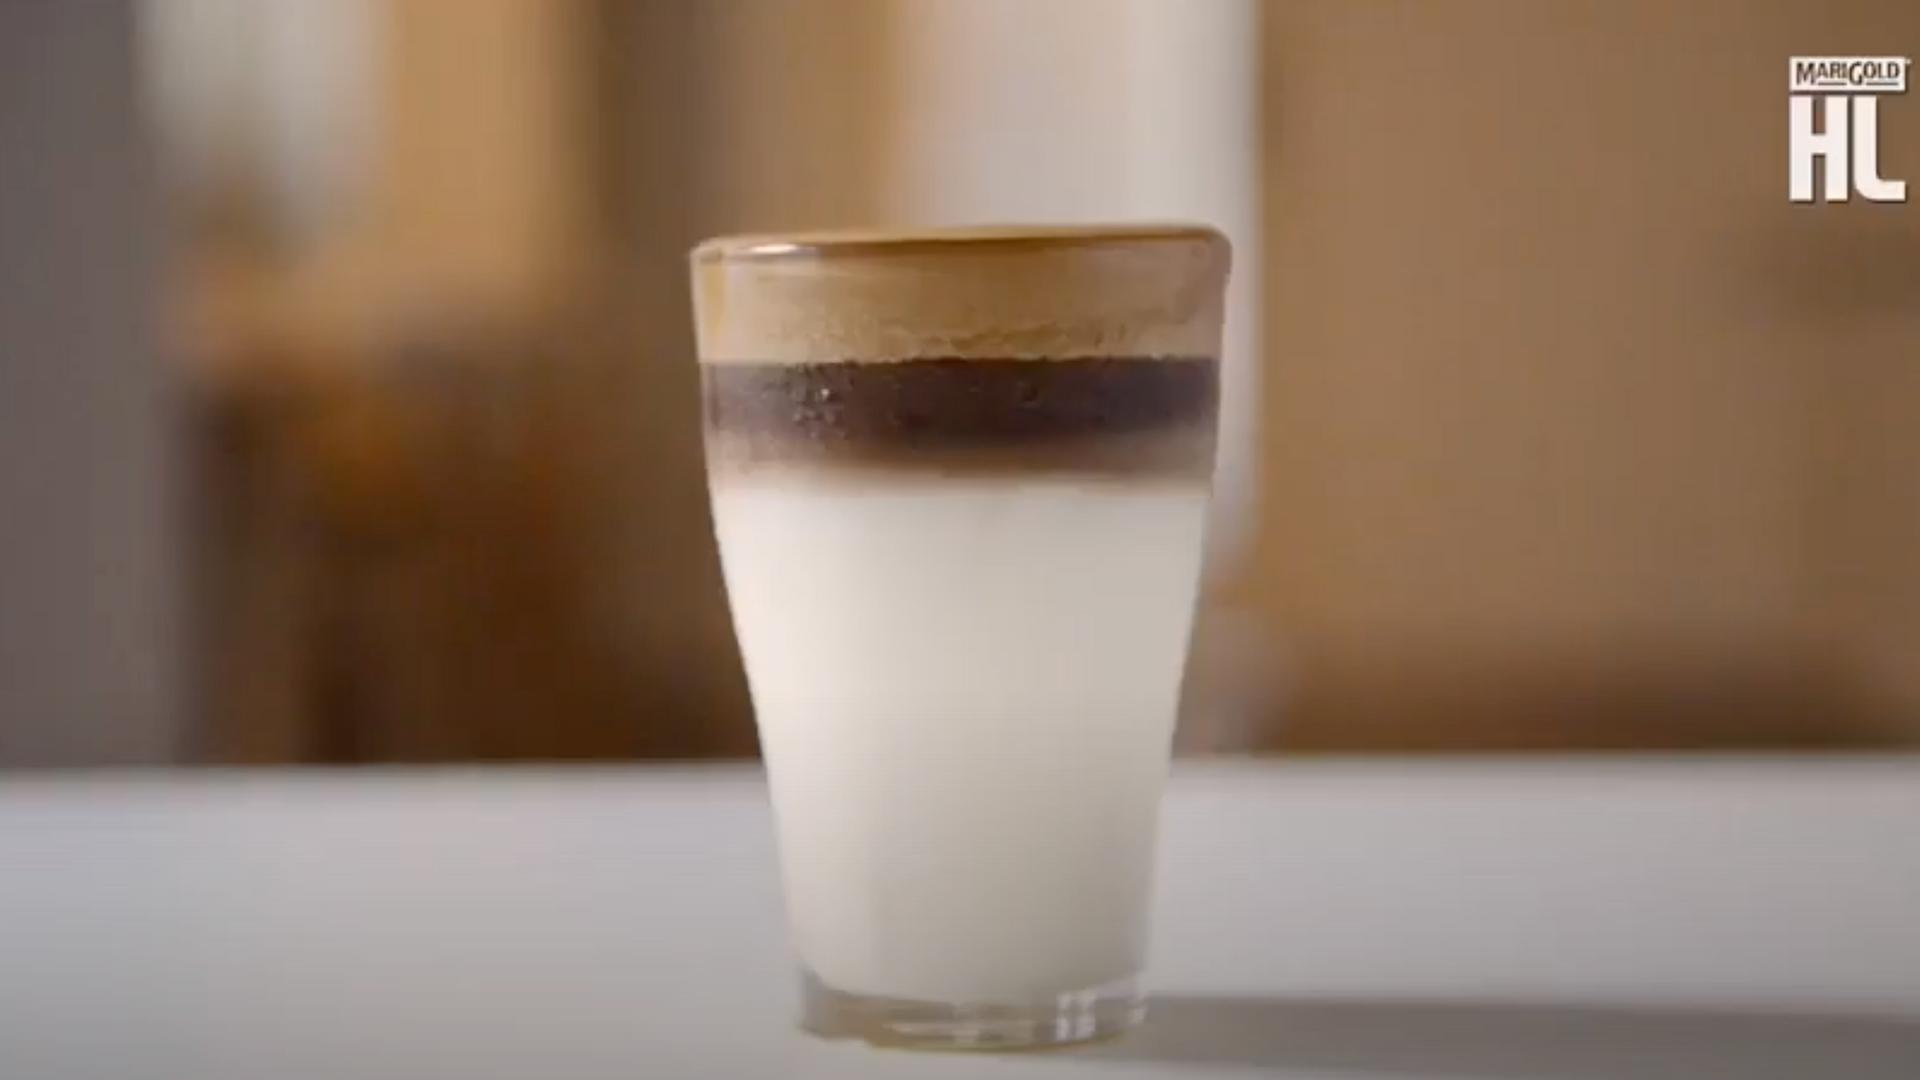 MARIGOLD HL Milk - Dalgona Coffee